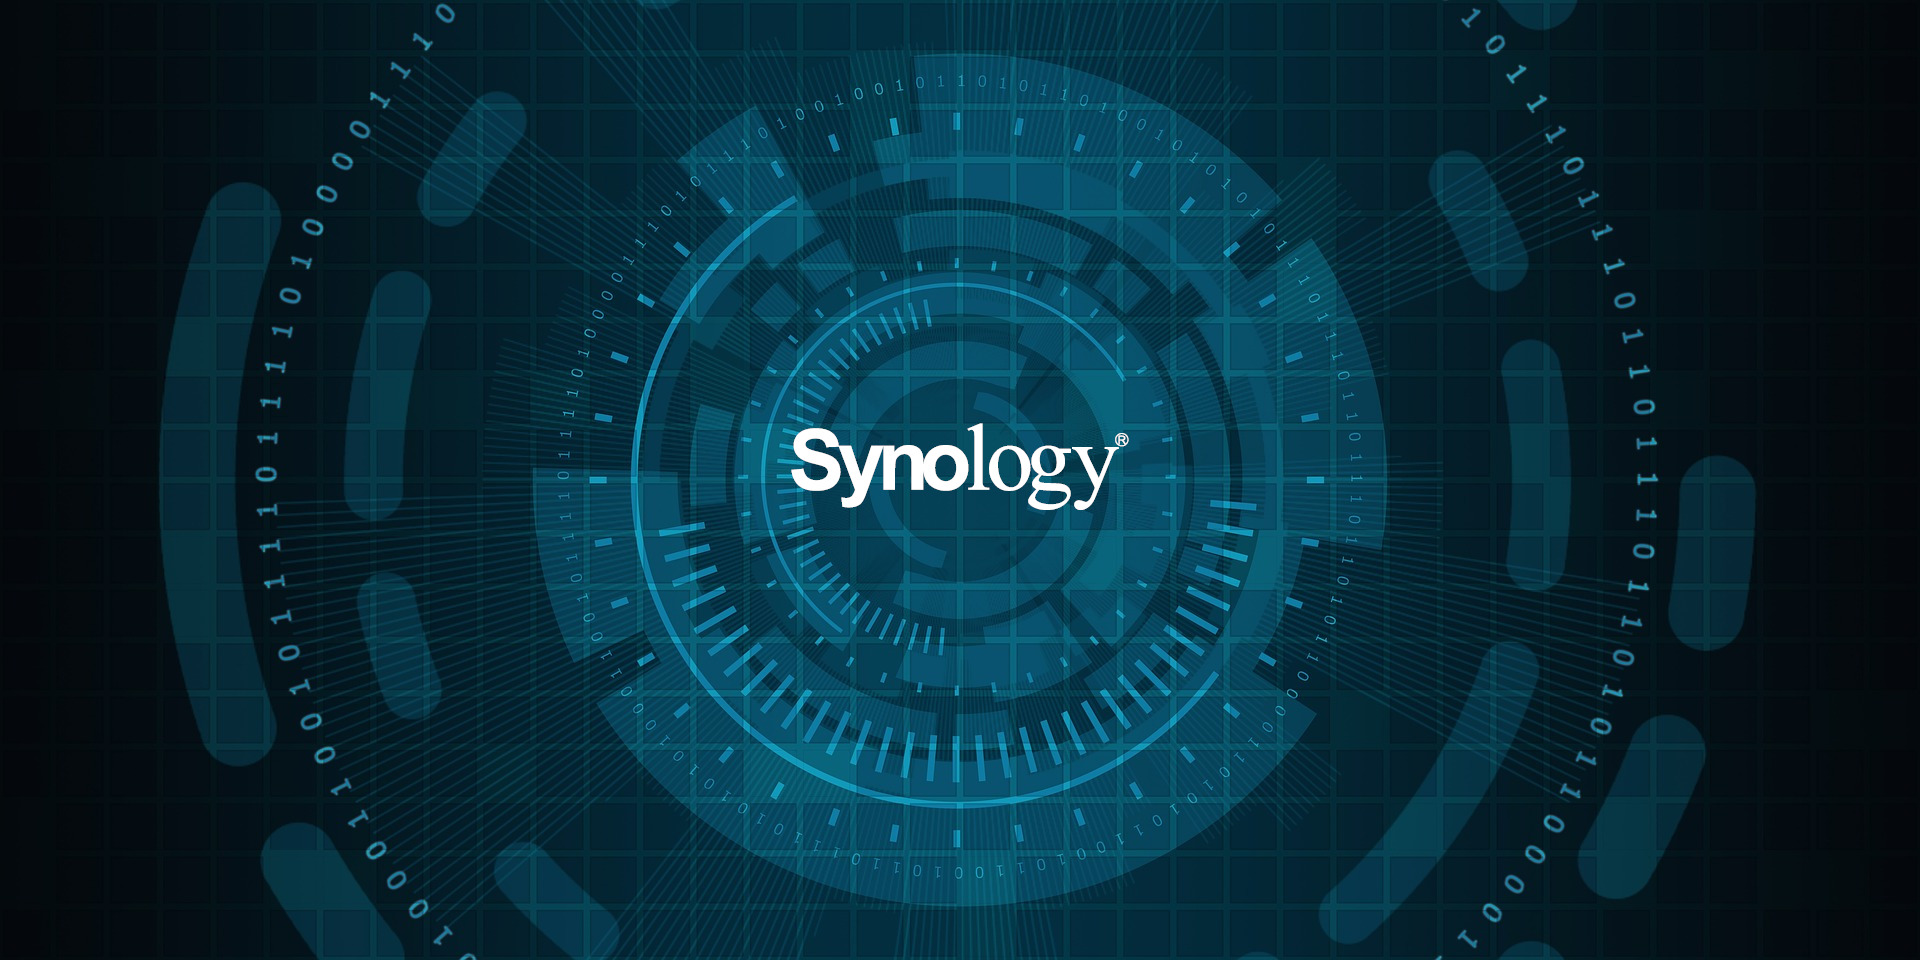 Synology Servicepartner